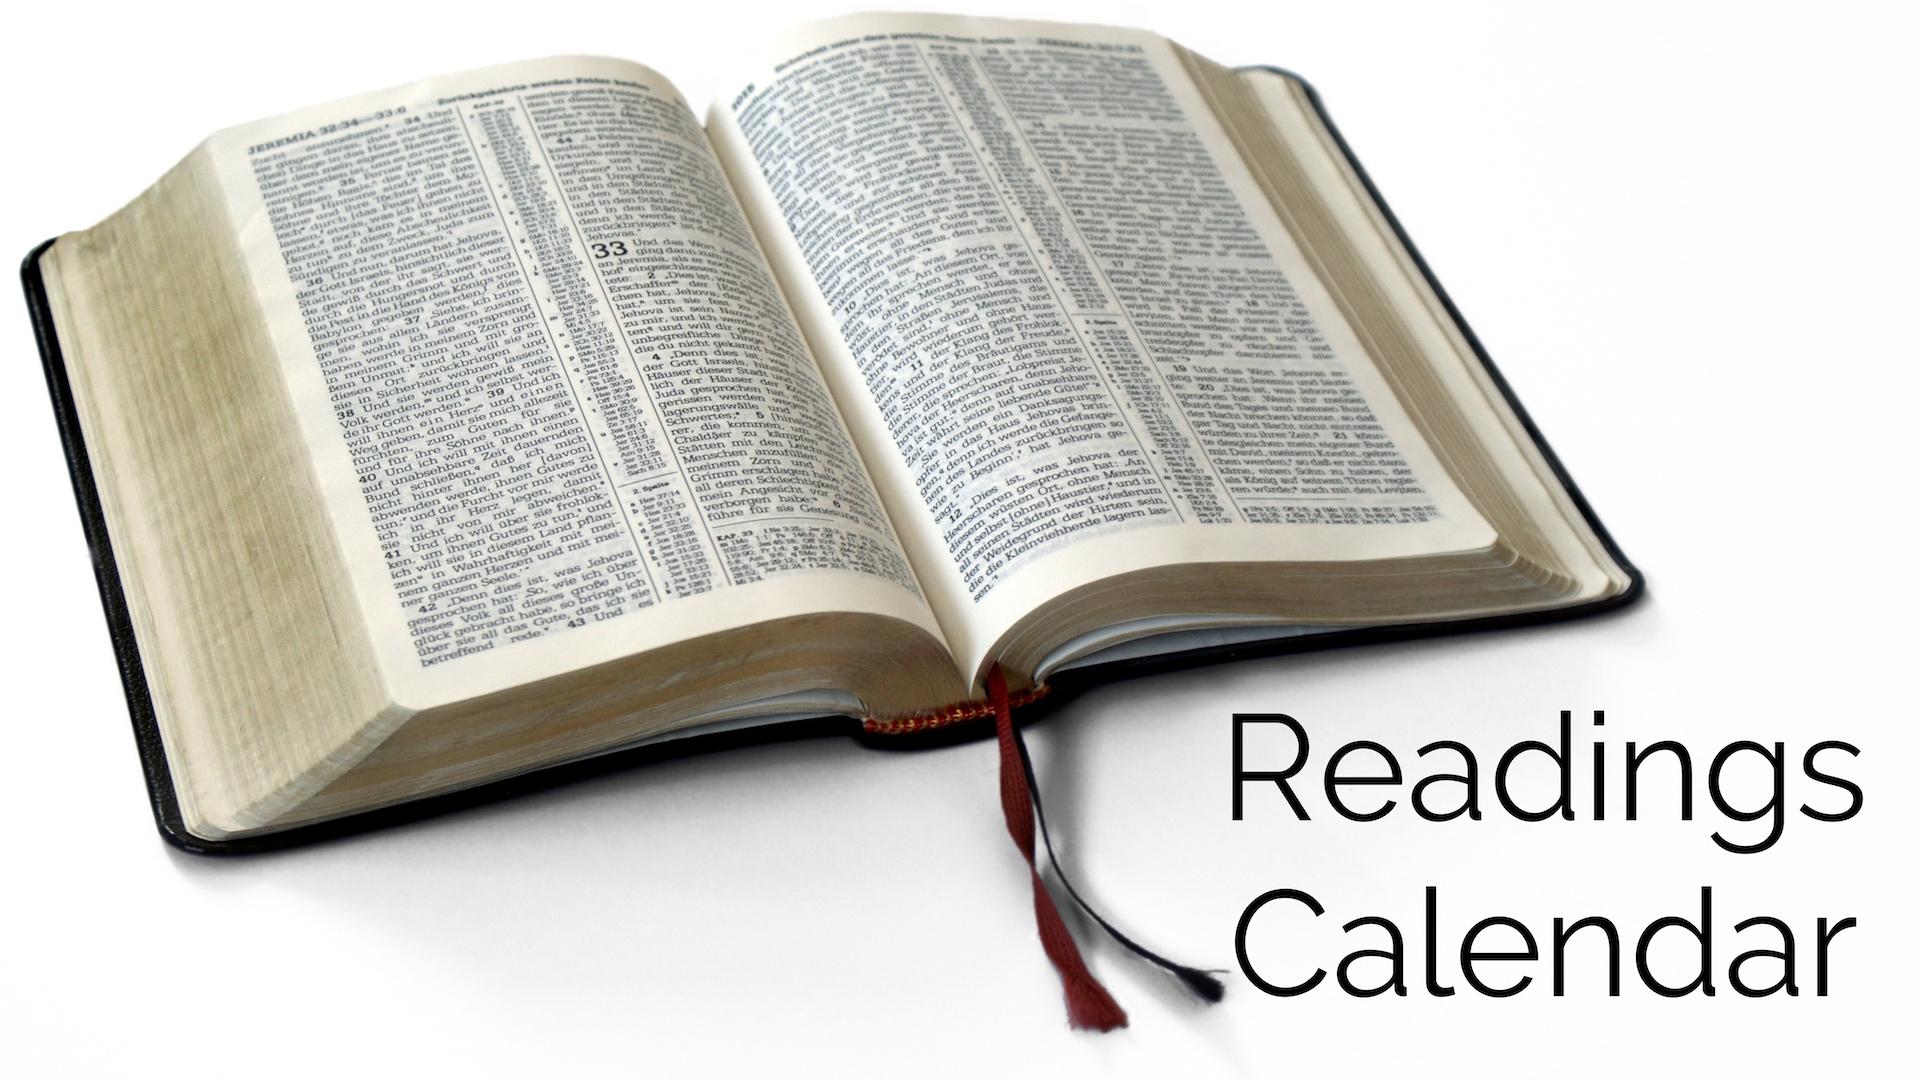 Readings Calendar.jpg